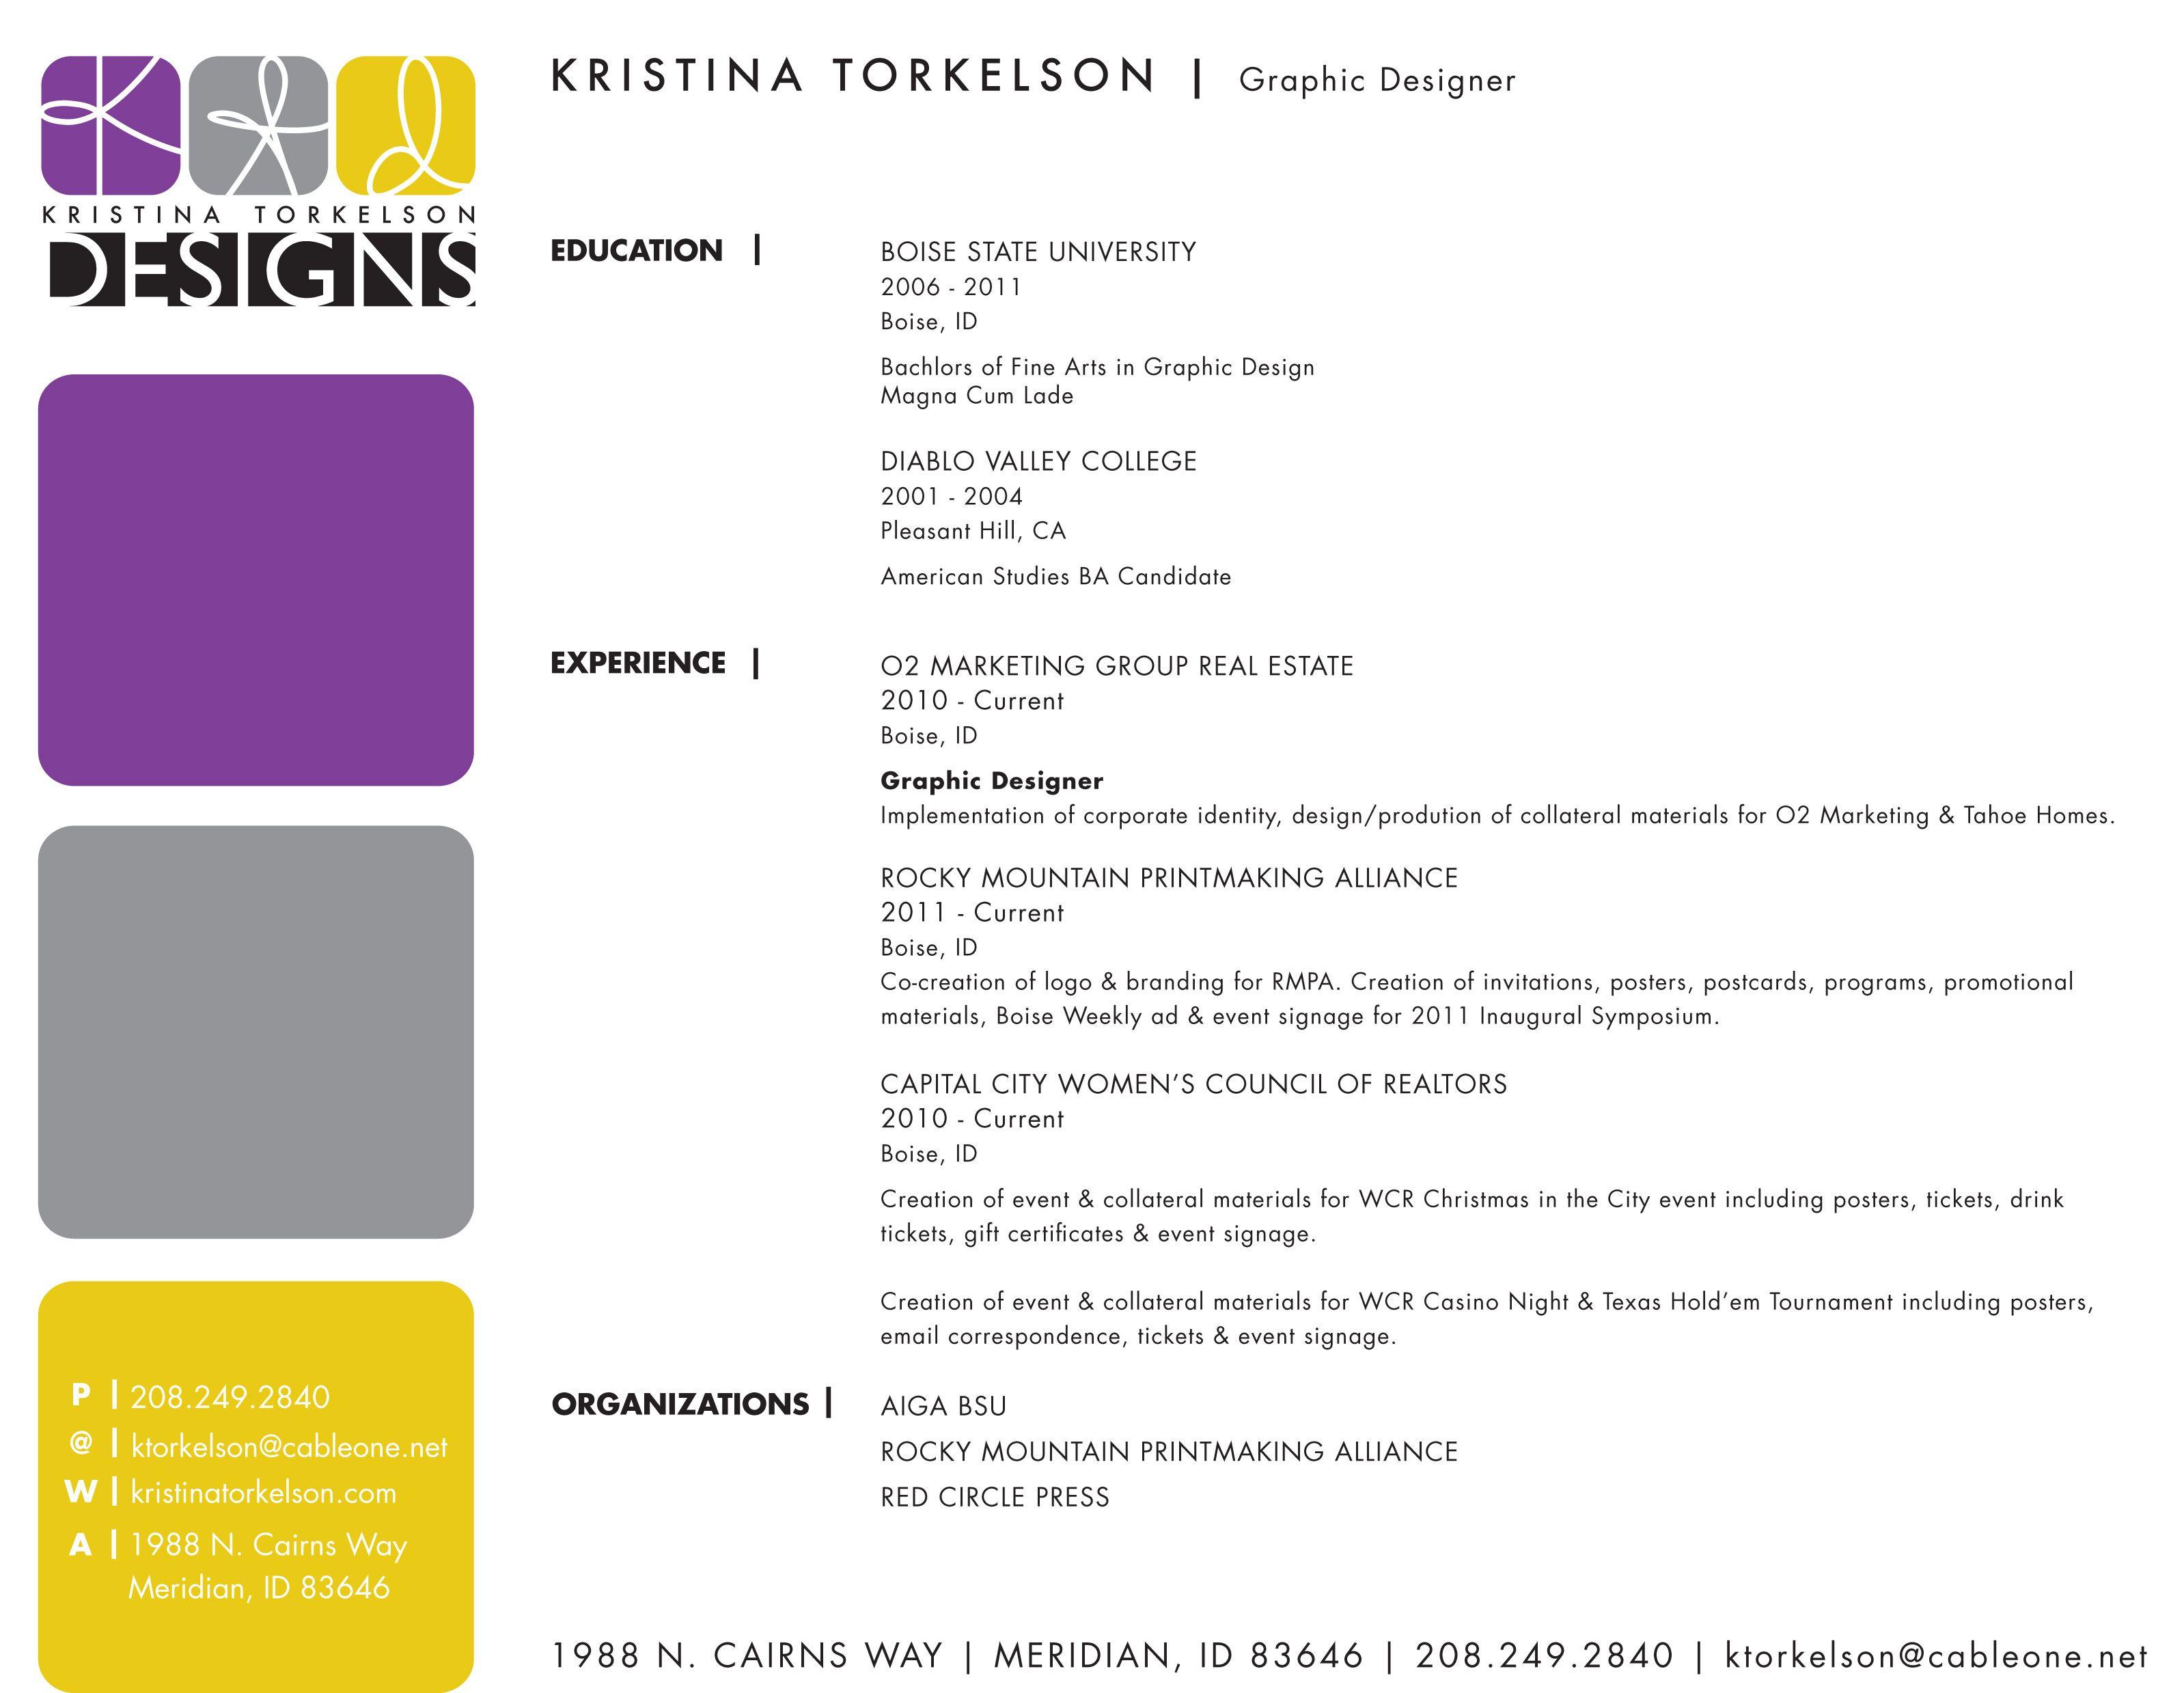 Resume Creation Resume  R E S U M E  Pinterest  Personal Branding And Template